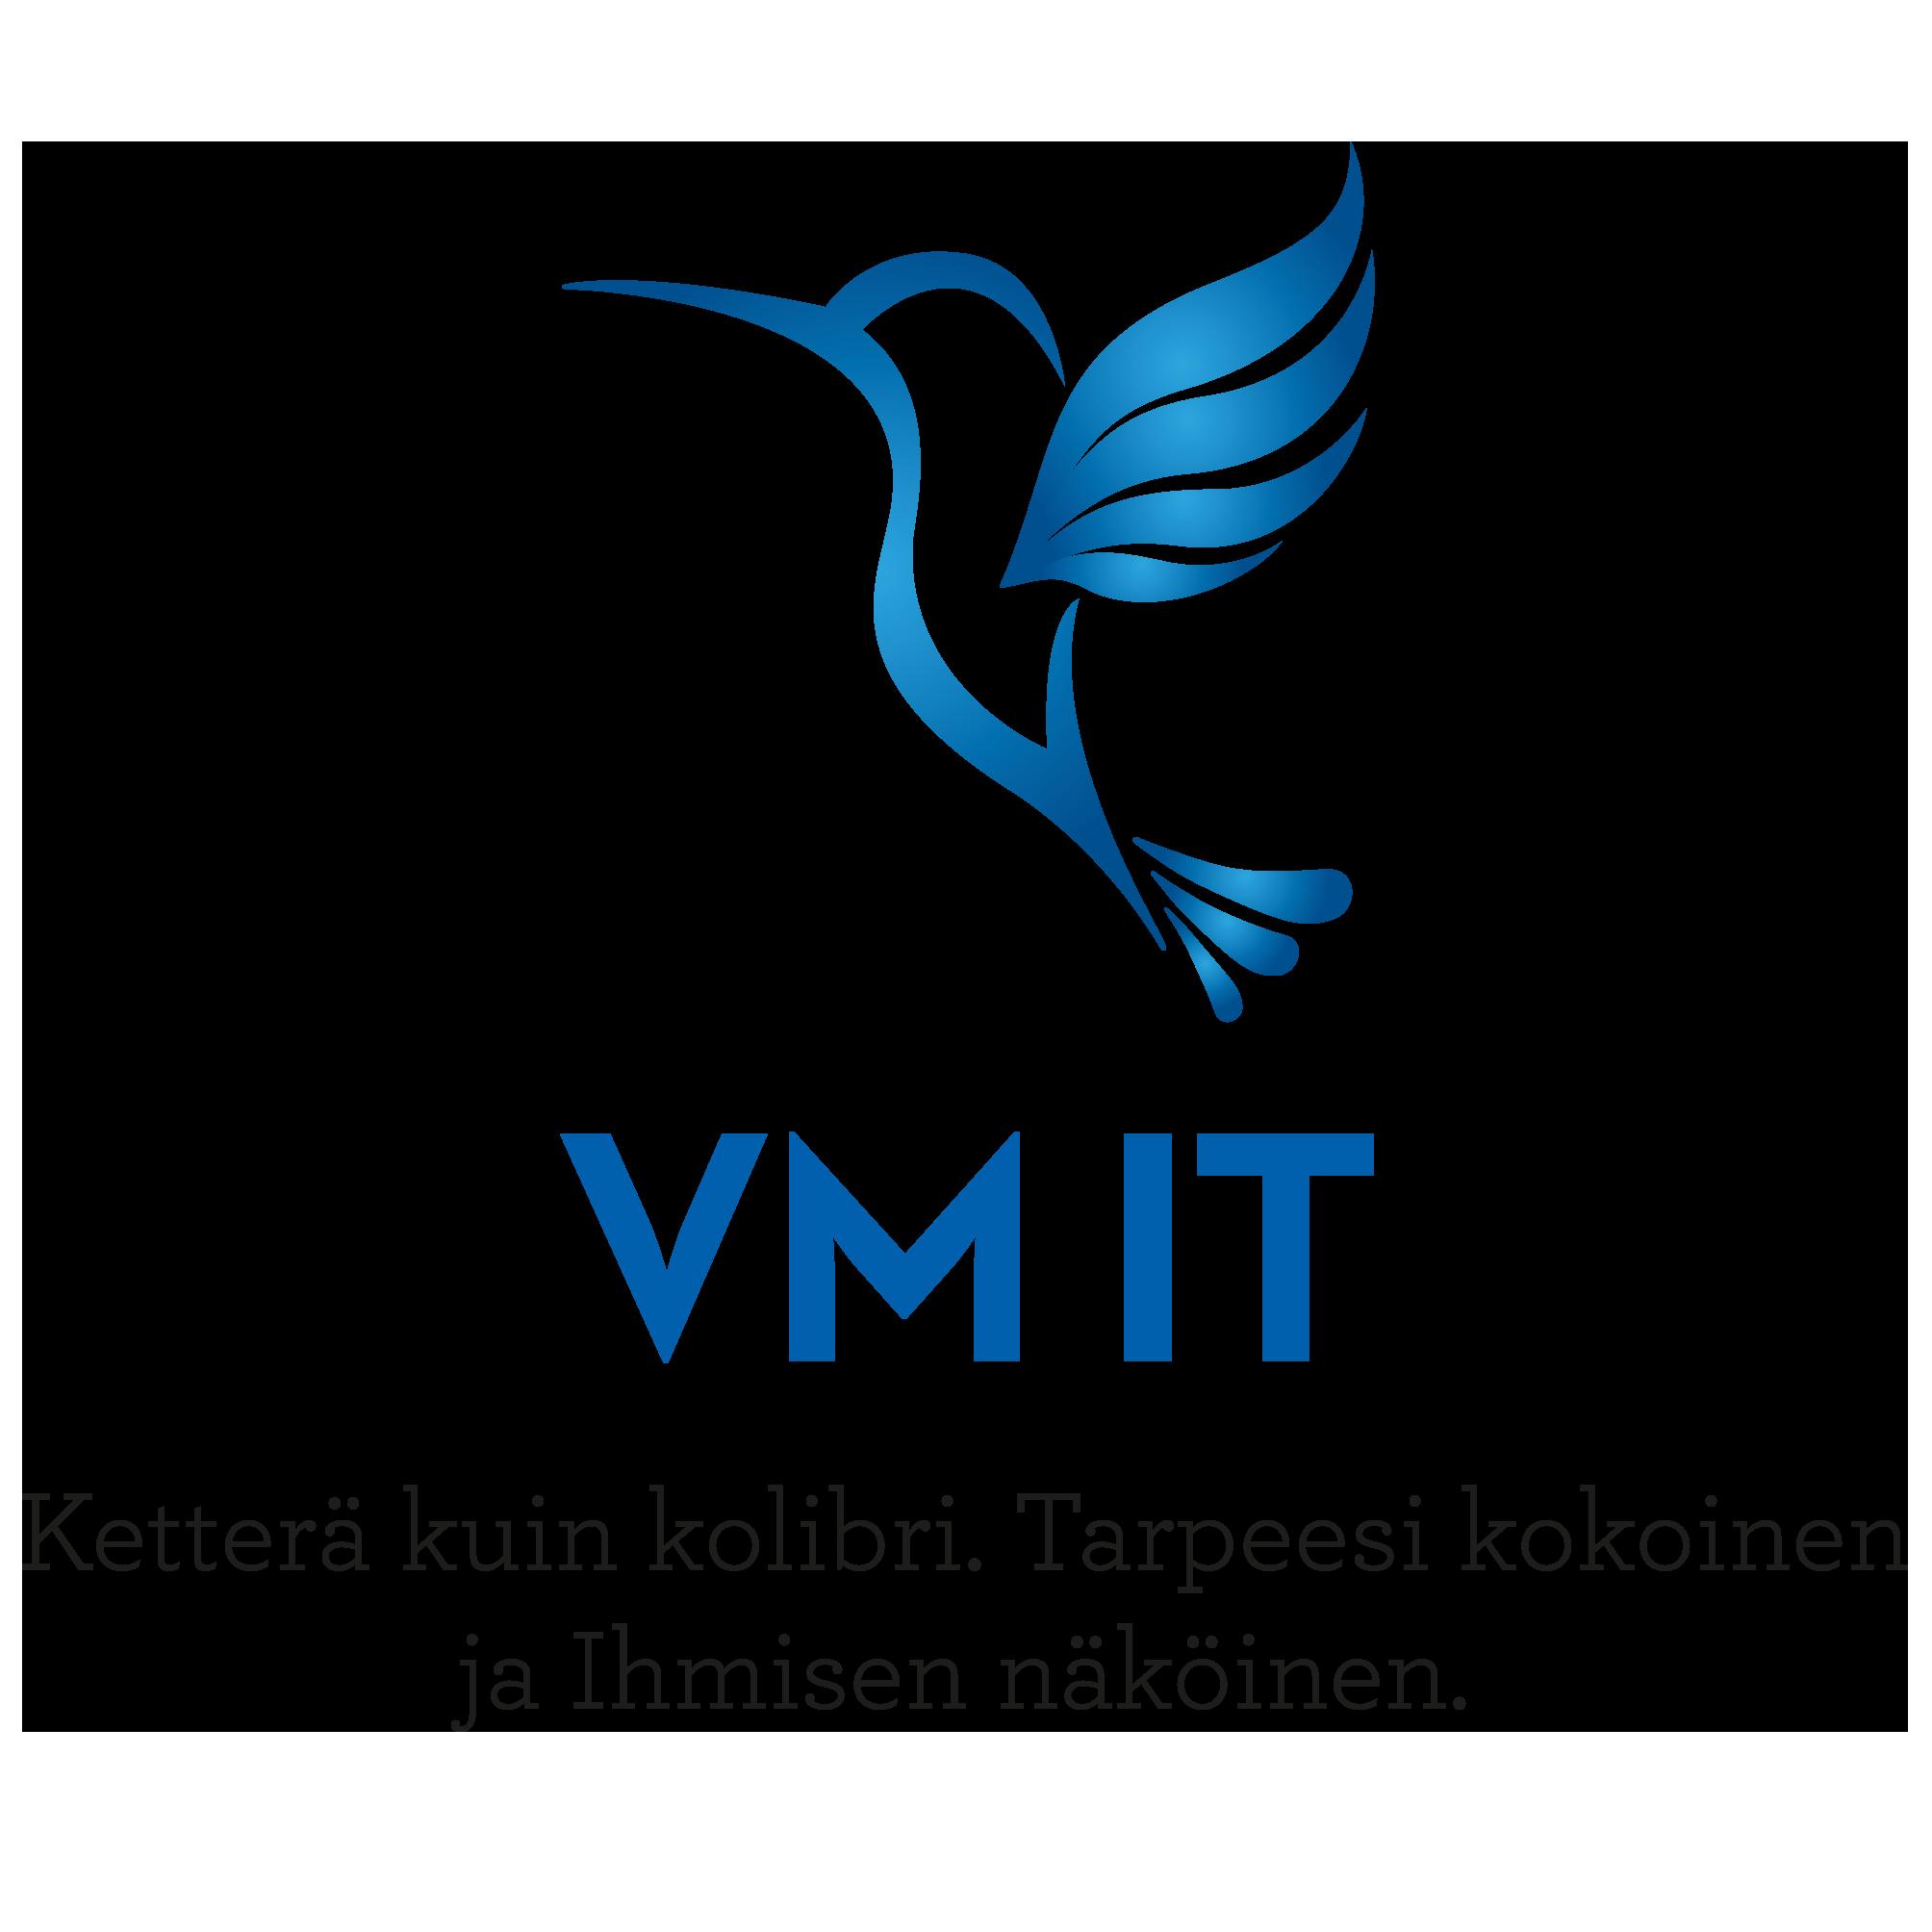 VMIT_logo_slogan.png